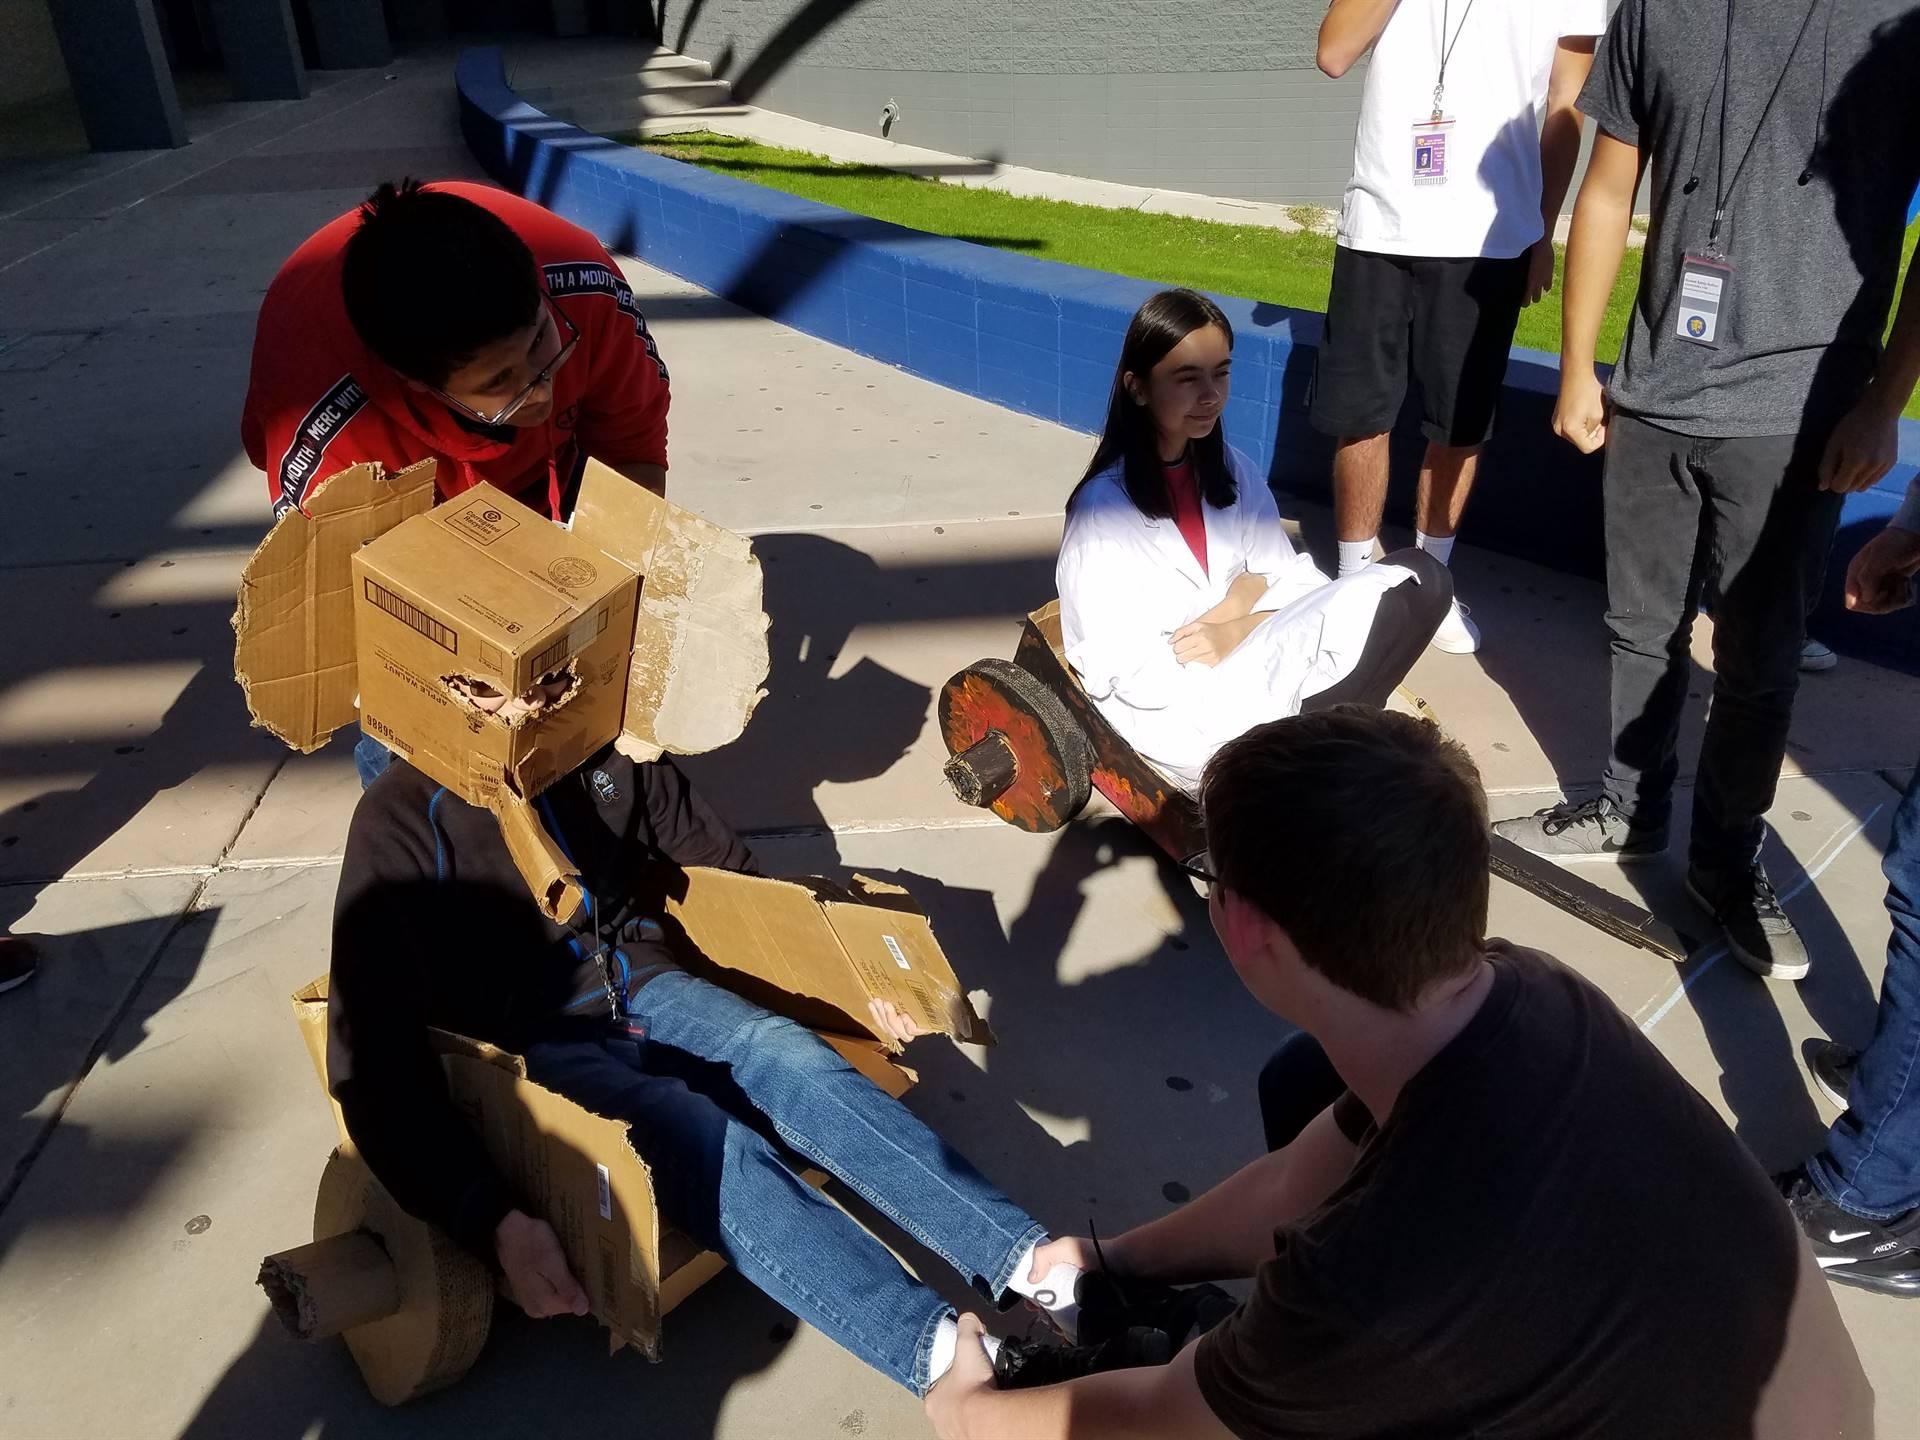 Engineering I Great Cardboard Chariot Race Team Elephante 20191211 (1)